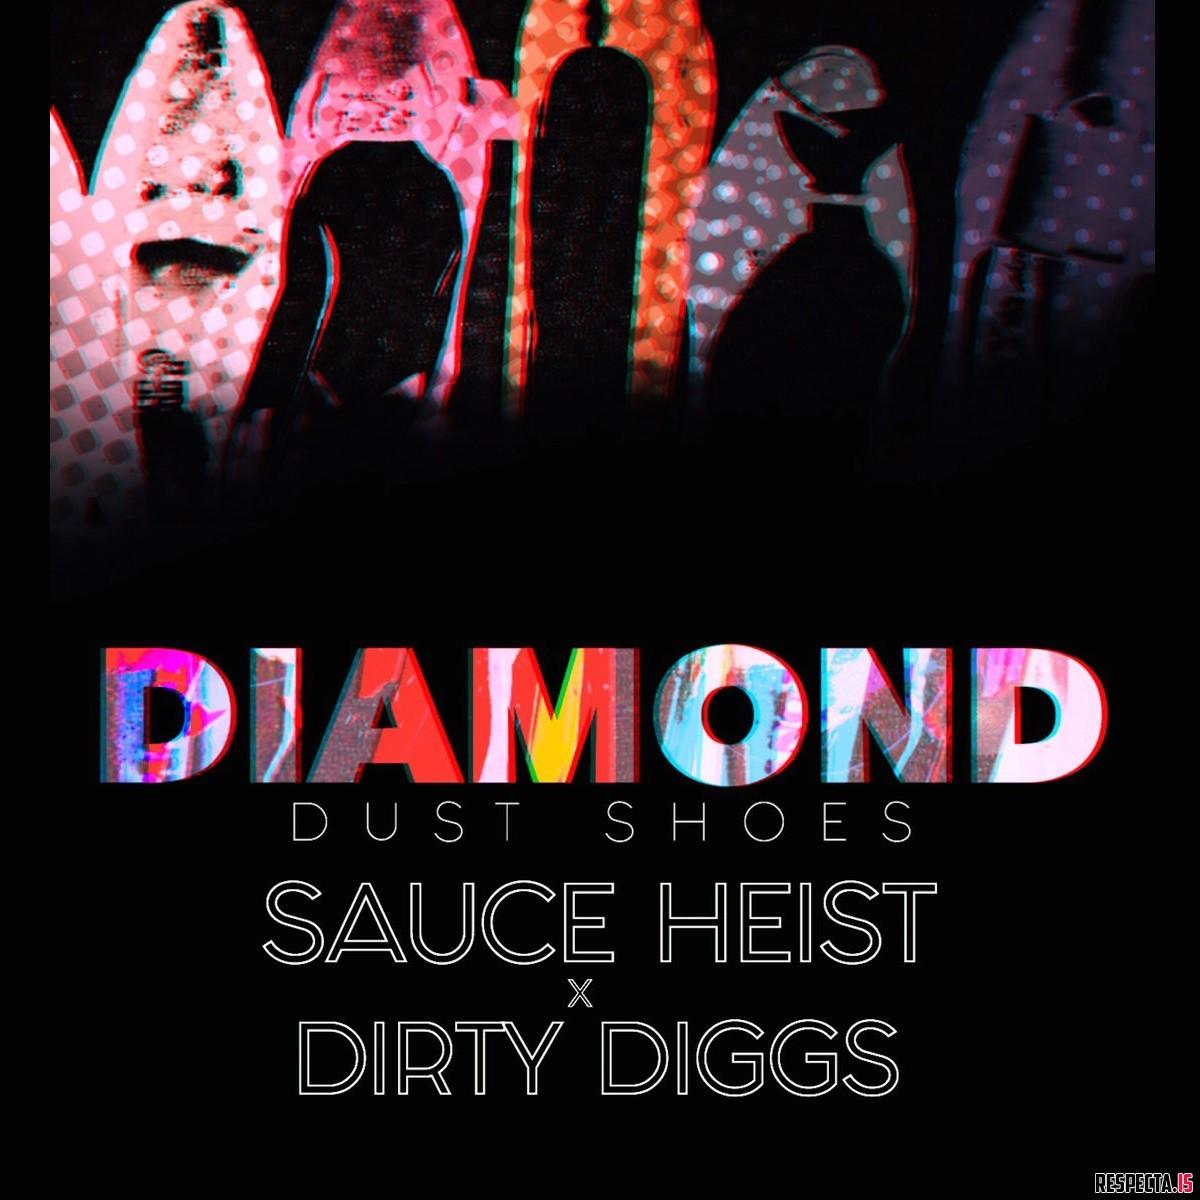 1537605260_auce-heist-diamond-dust-shoes